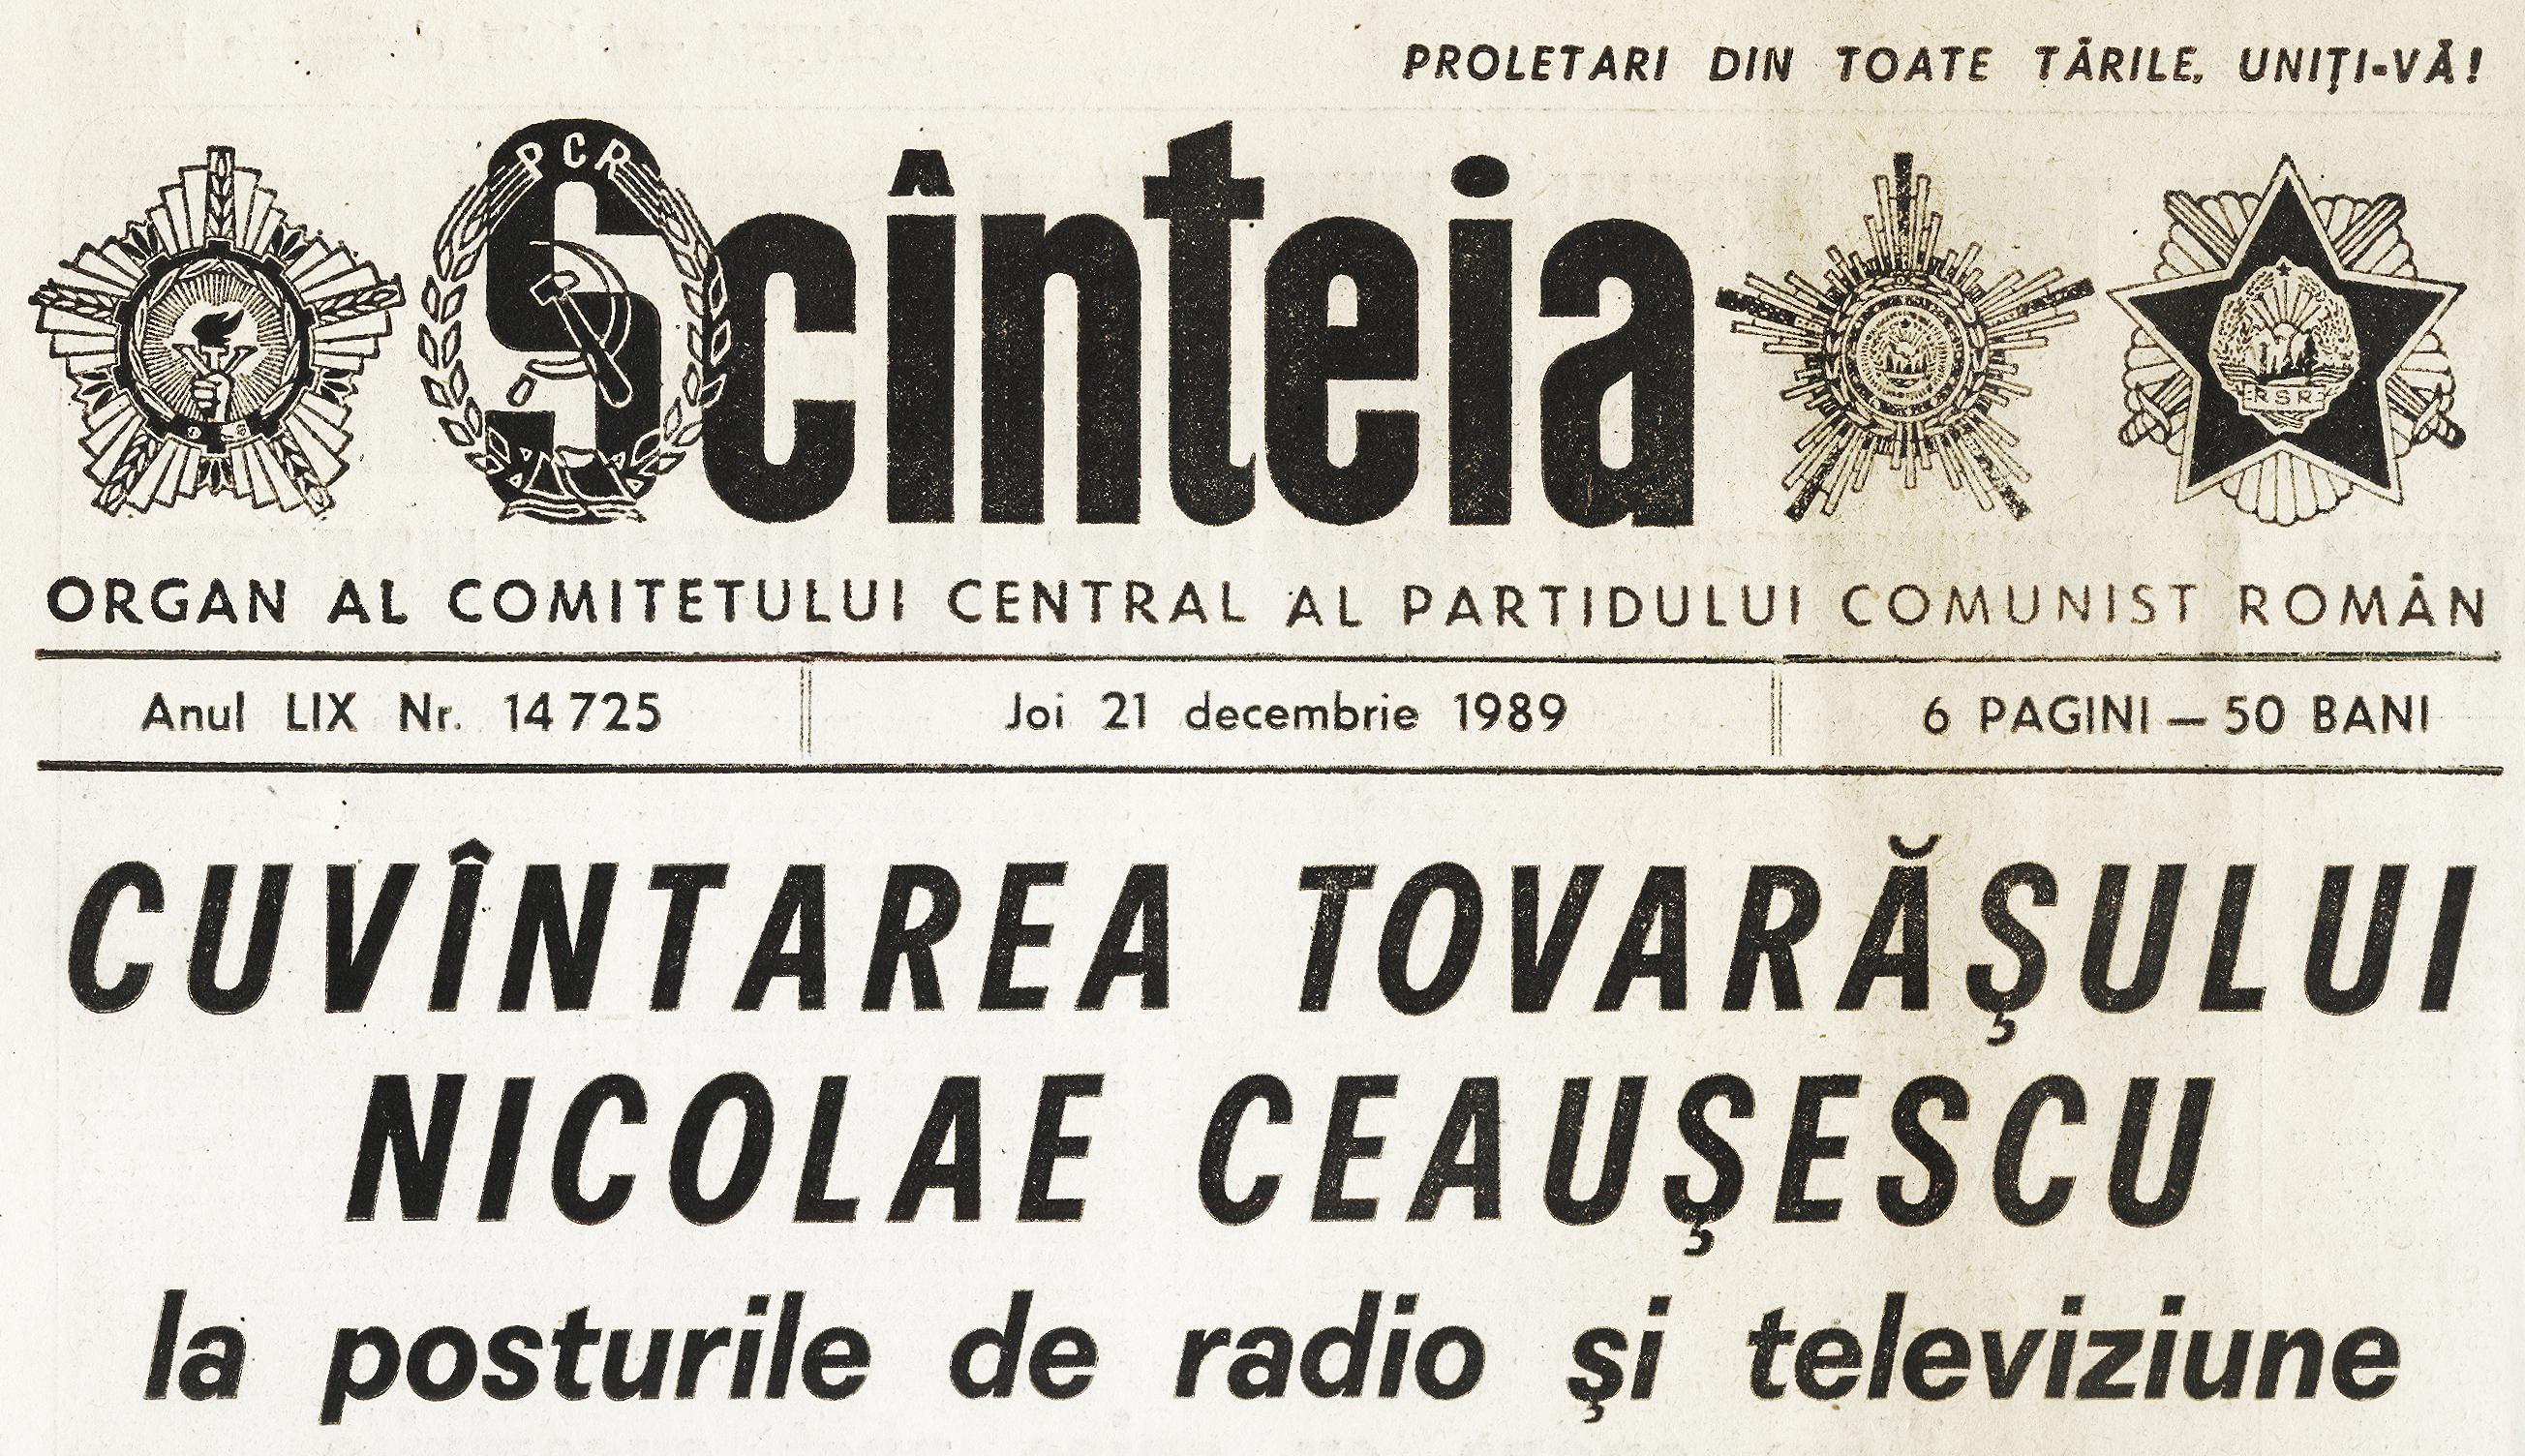 Scînteia_21_decembrie_1989-3